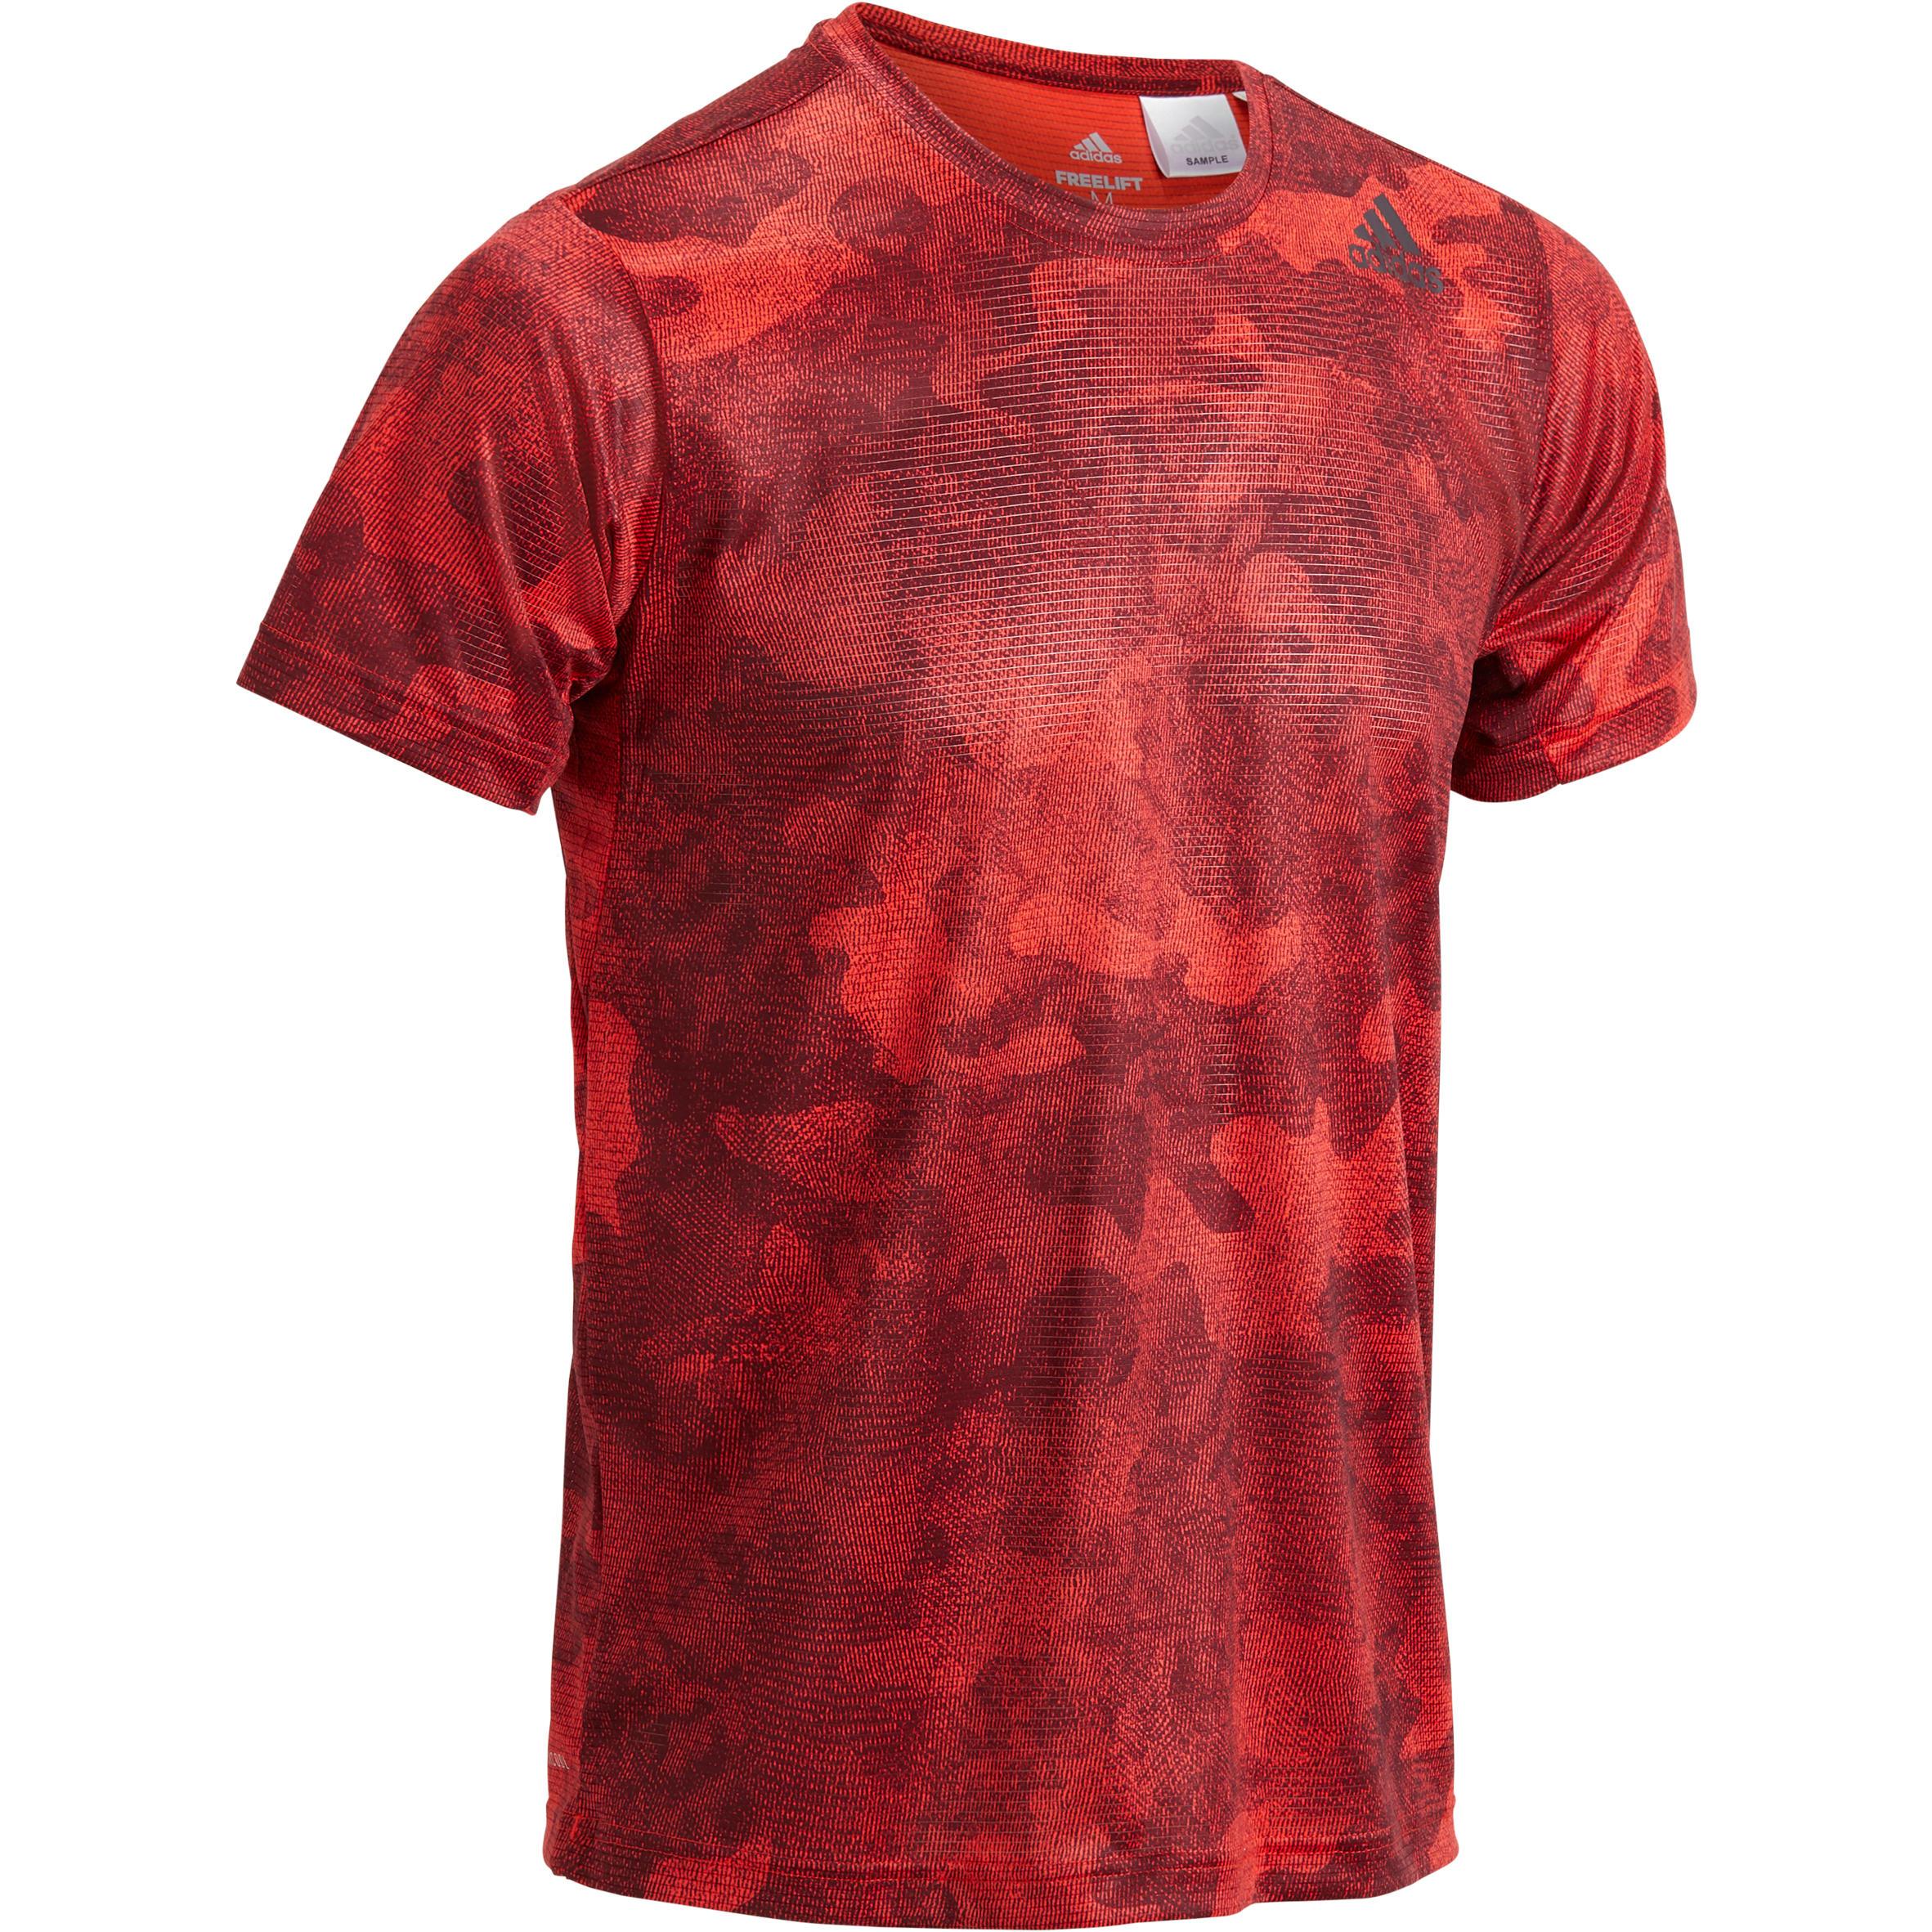 Adidas T-shirt Adidas freelift rood